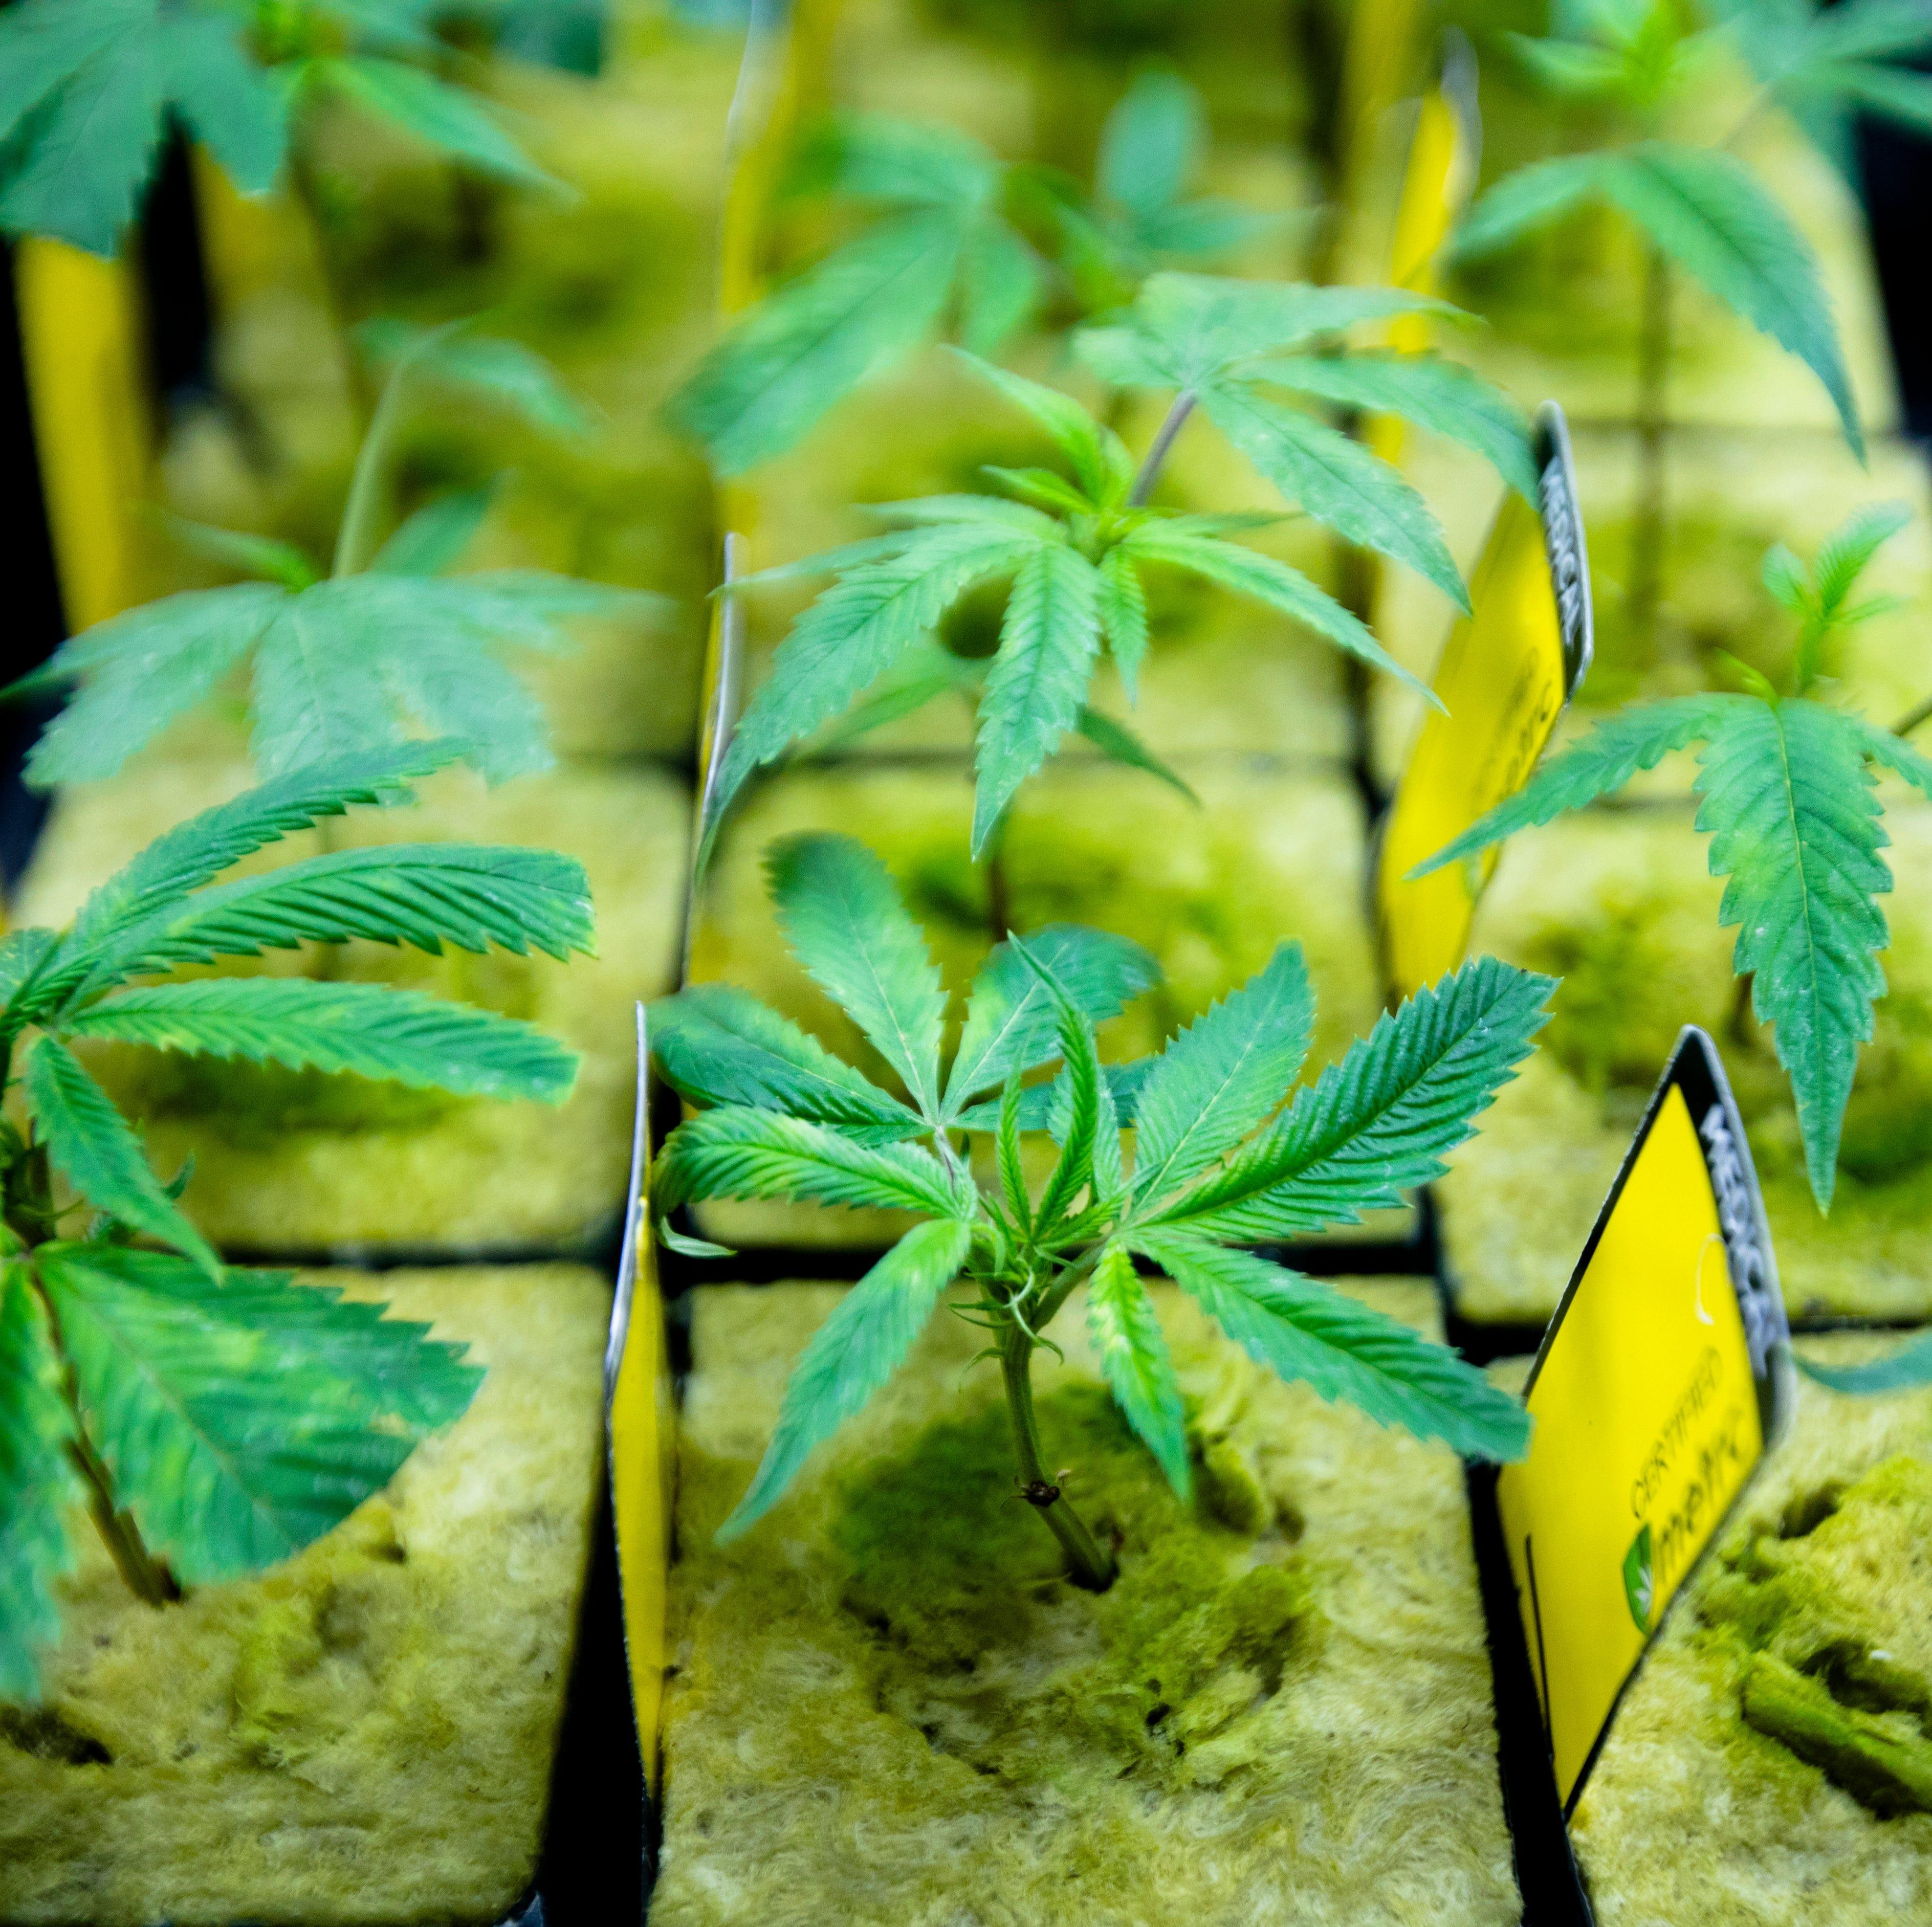 Cincinnati councilman proposes lower limit on how much marijuana Cincinnati will permit